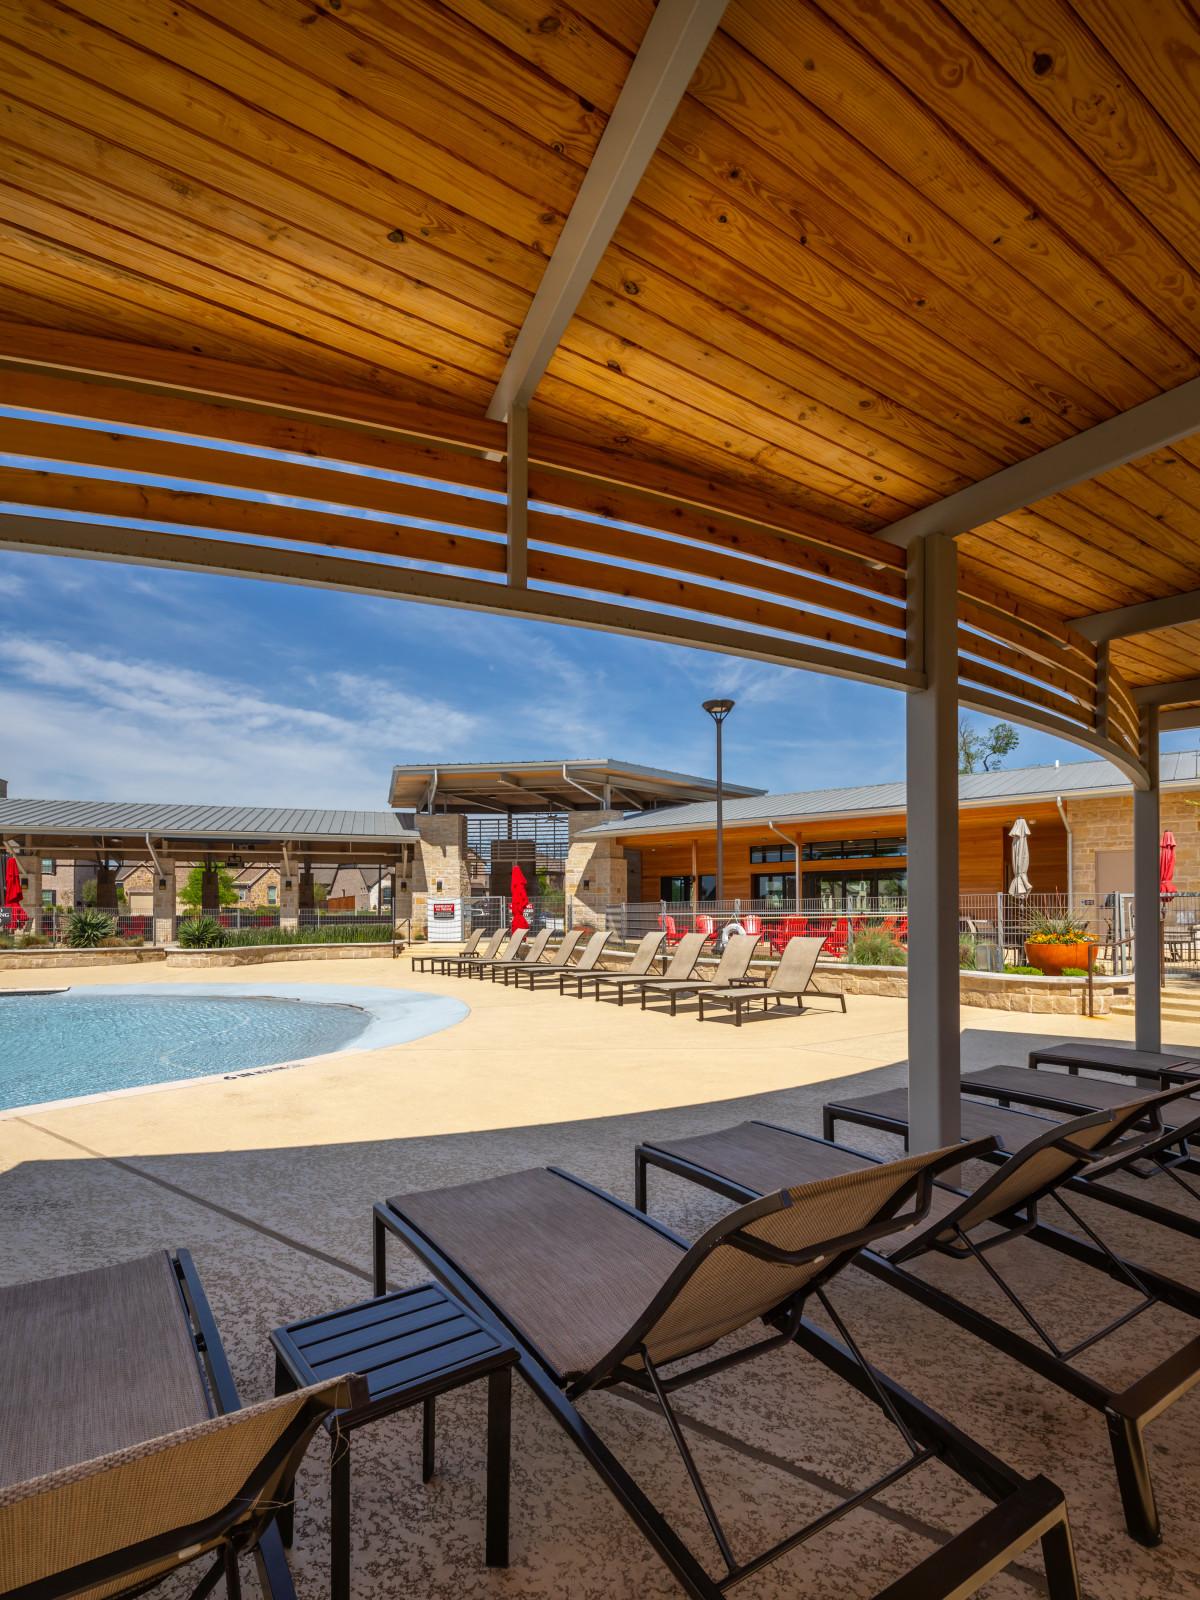 Trinity Falls community pool